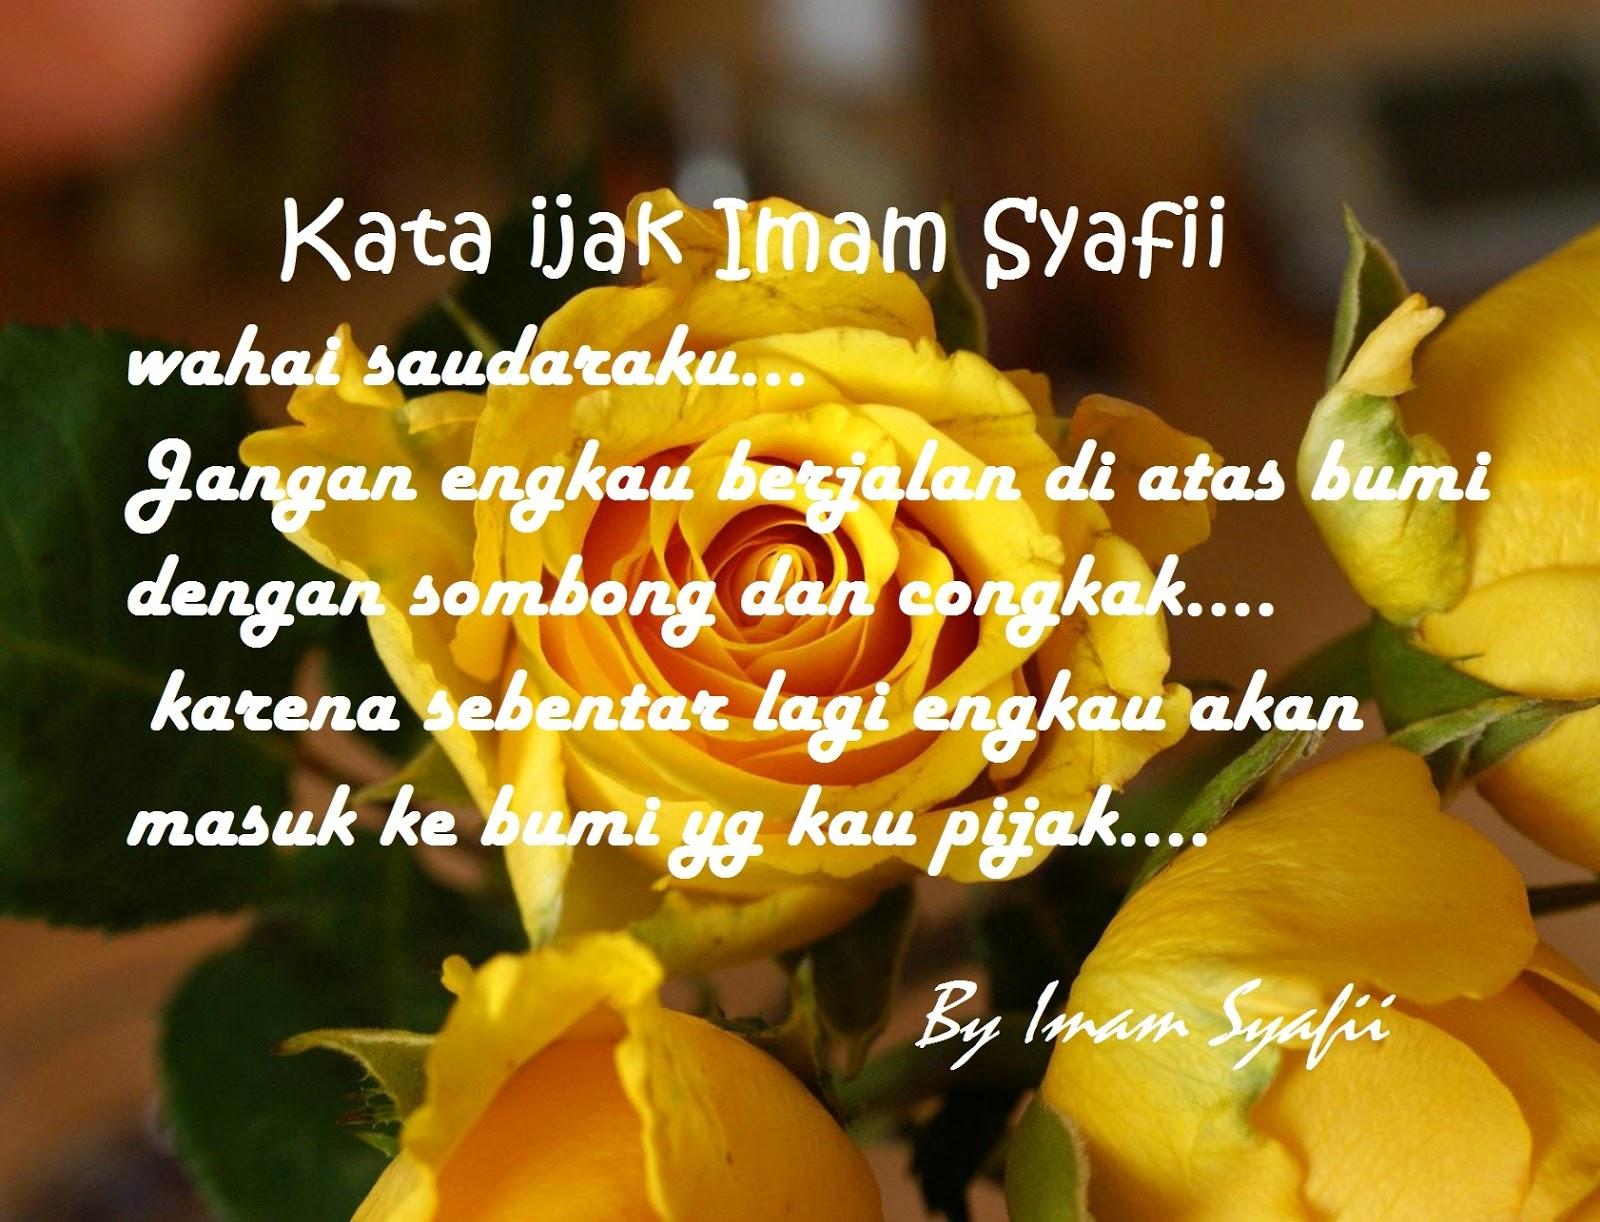 Gambar Dan Kata Kata Lucu Bahasa Aceh Stok Gambar Lucu